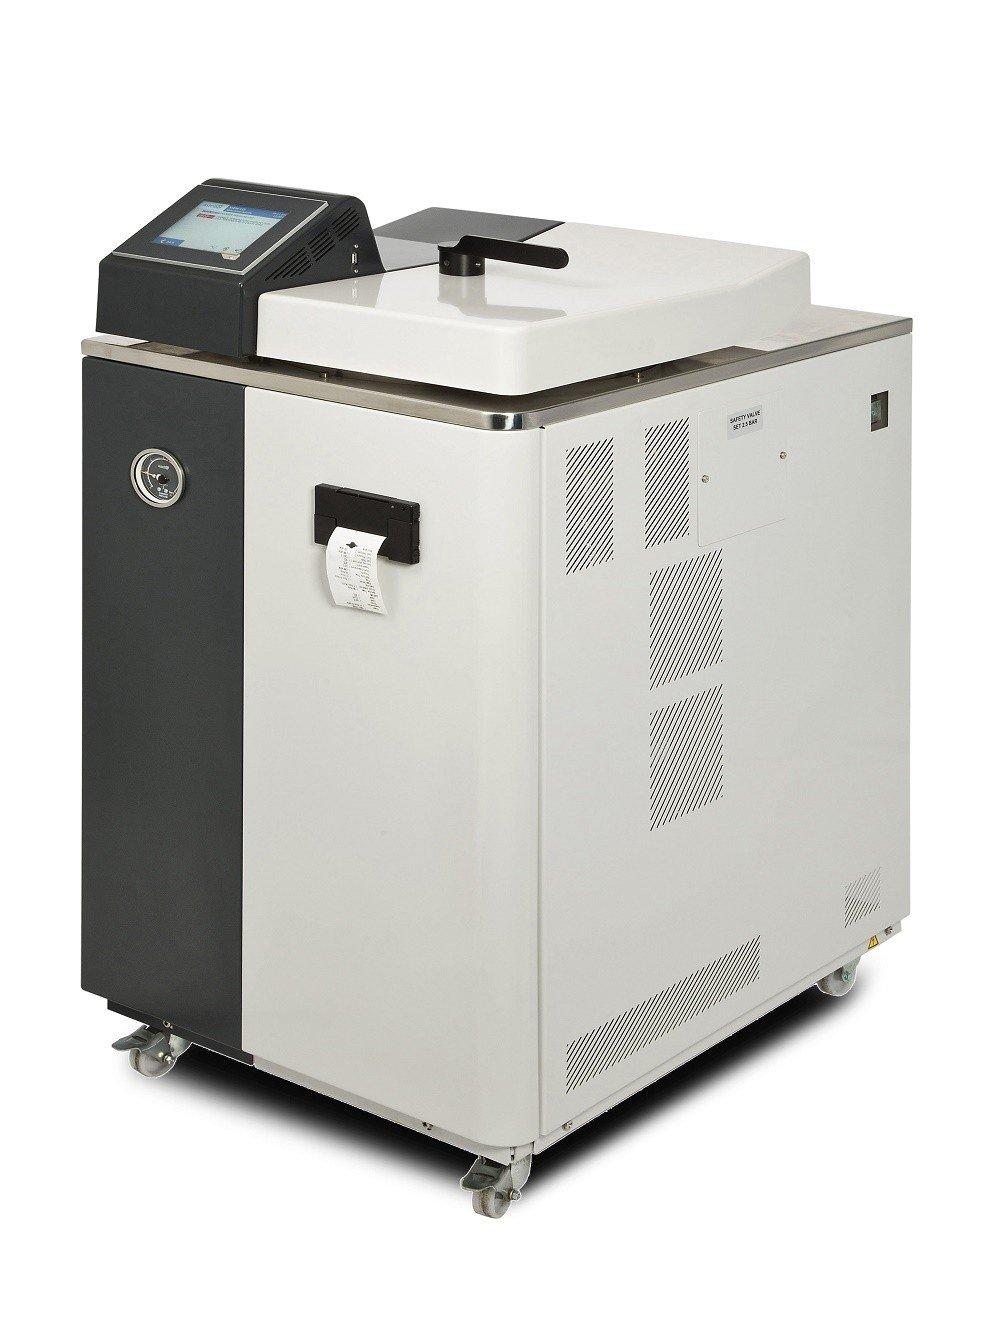 Astell Scientific Ama260bt Top Loading Laboratory